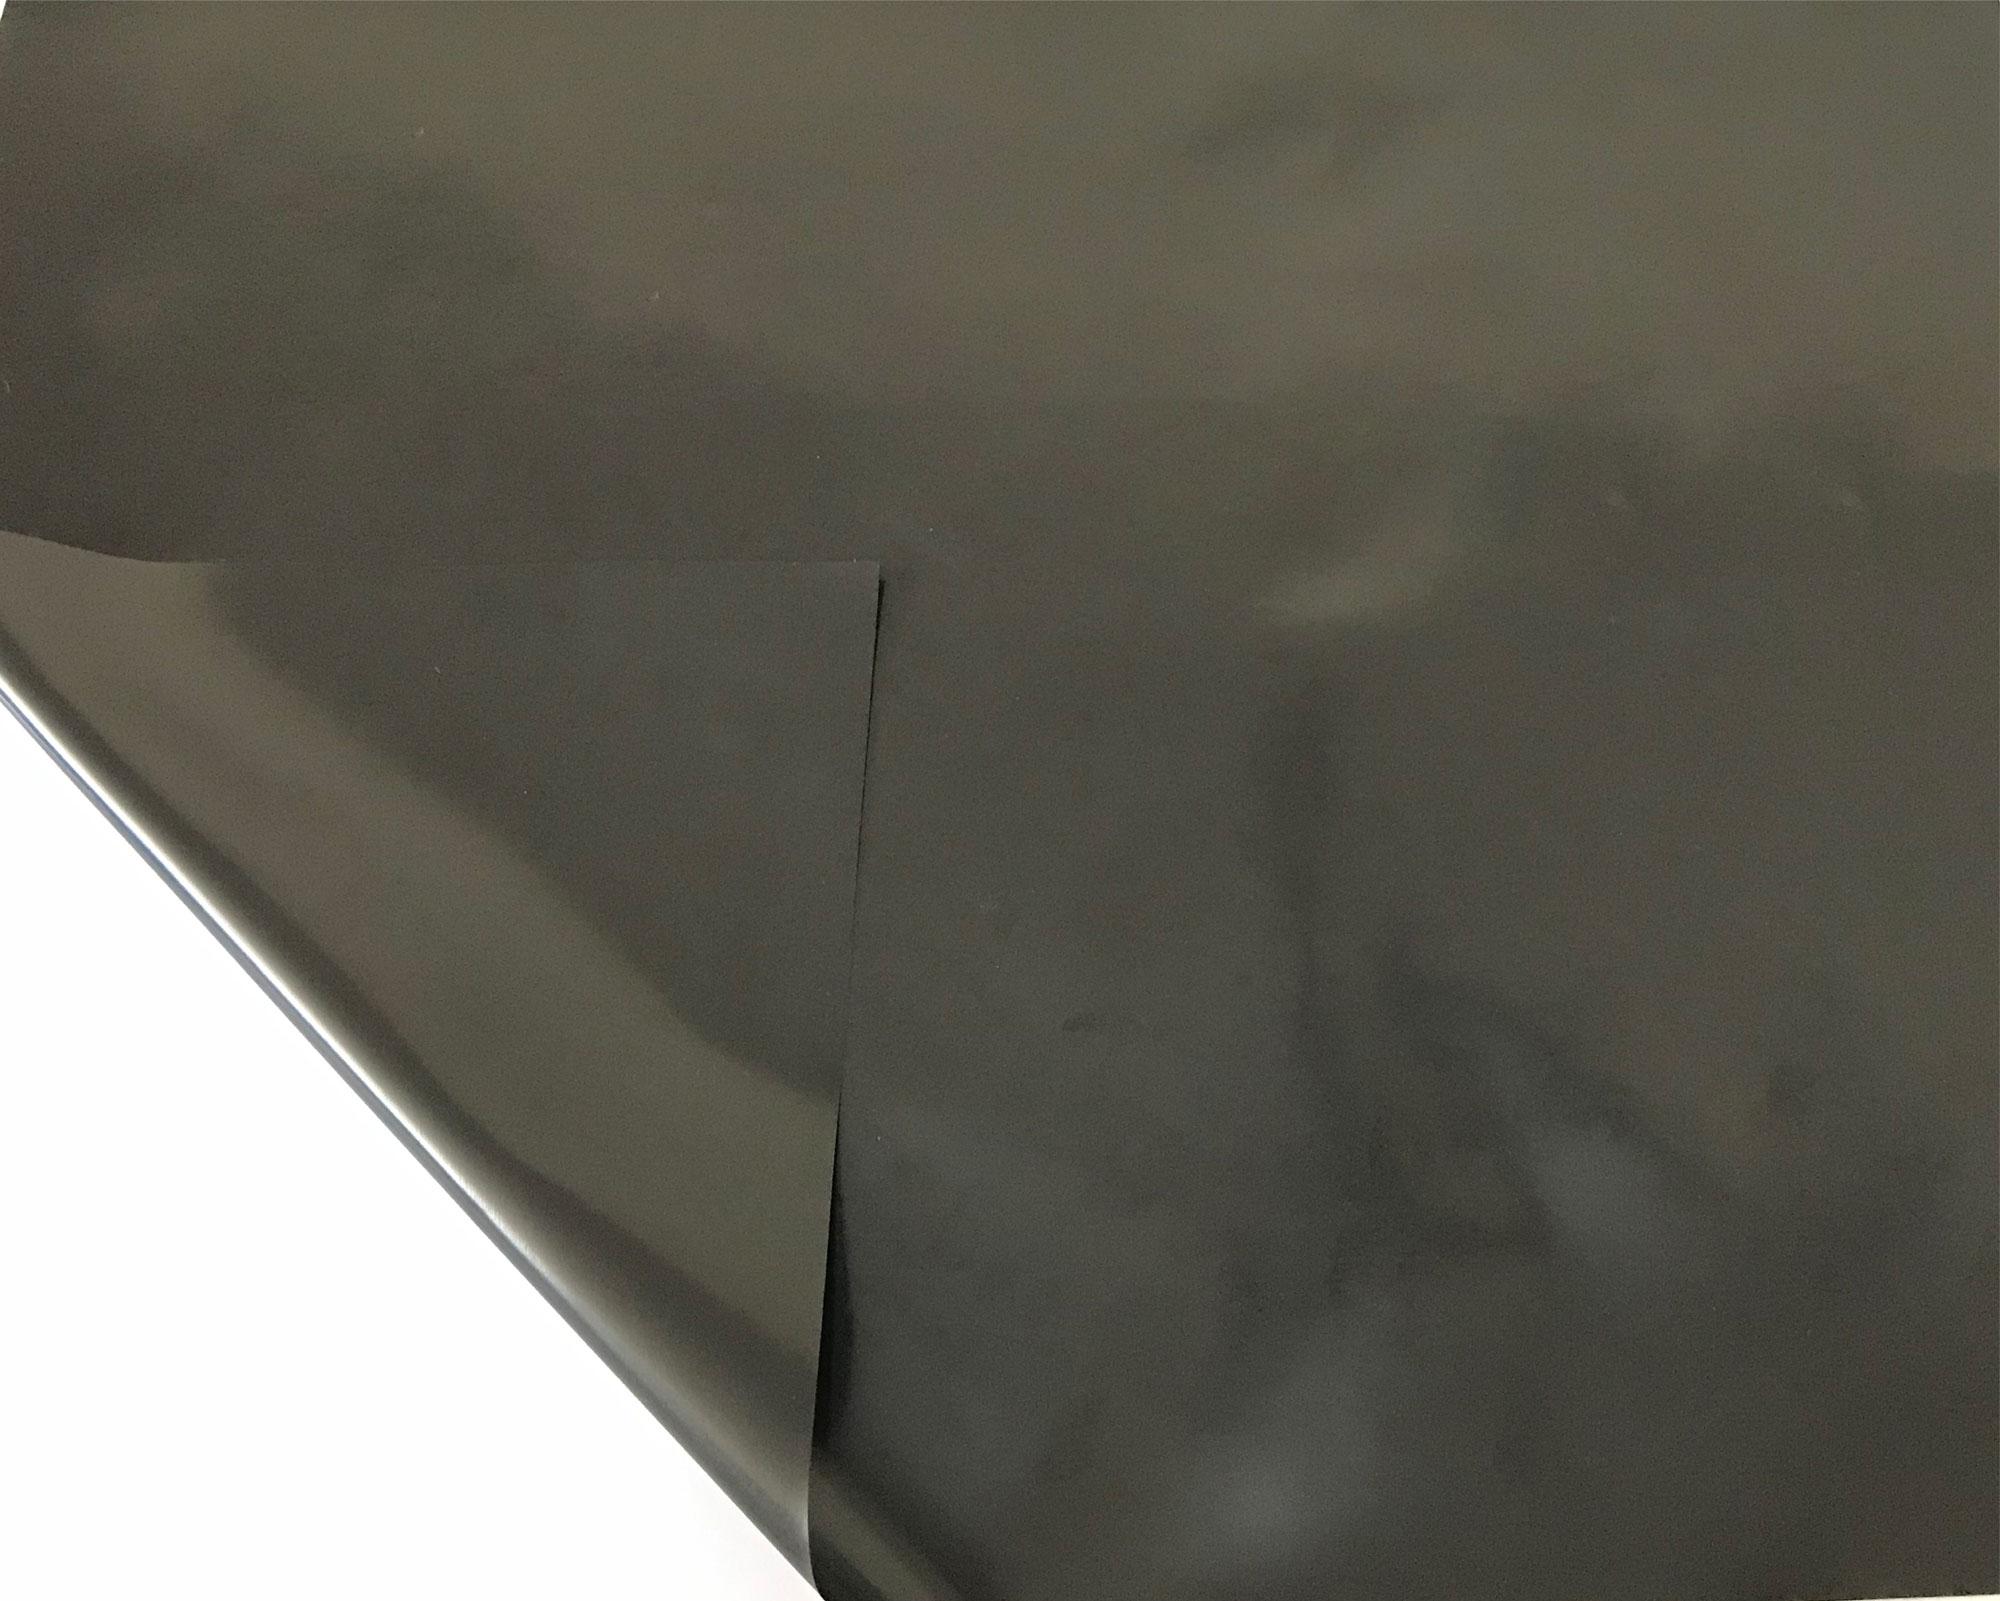 Lona Geomembrana + Manta Bidim 300 Micras - 5x3,5